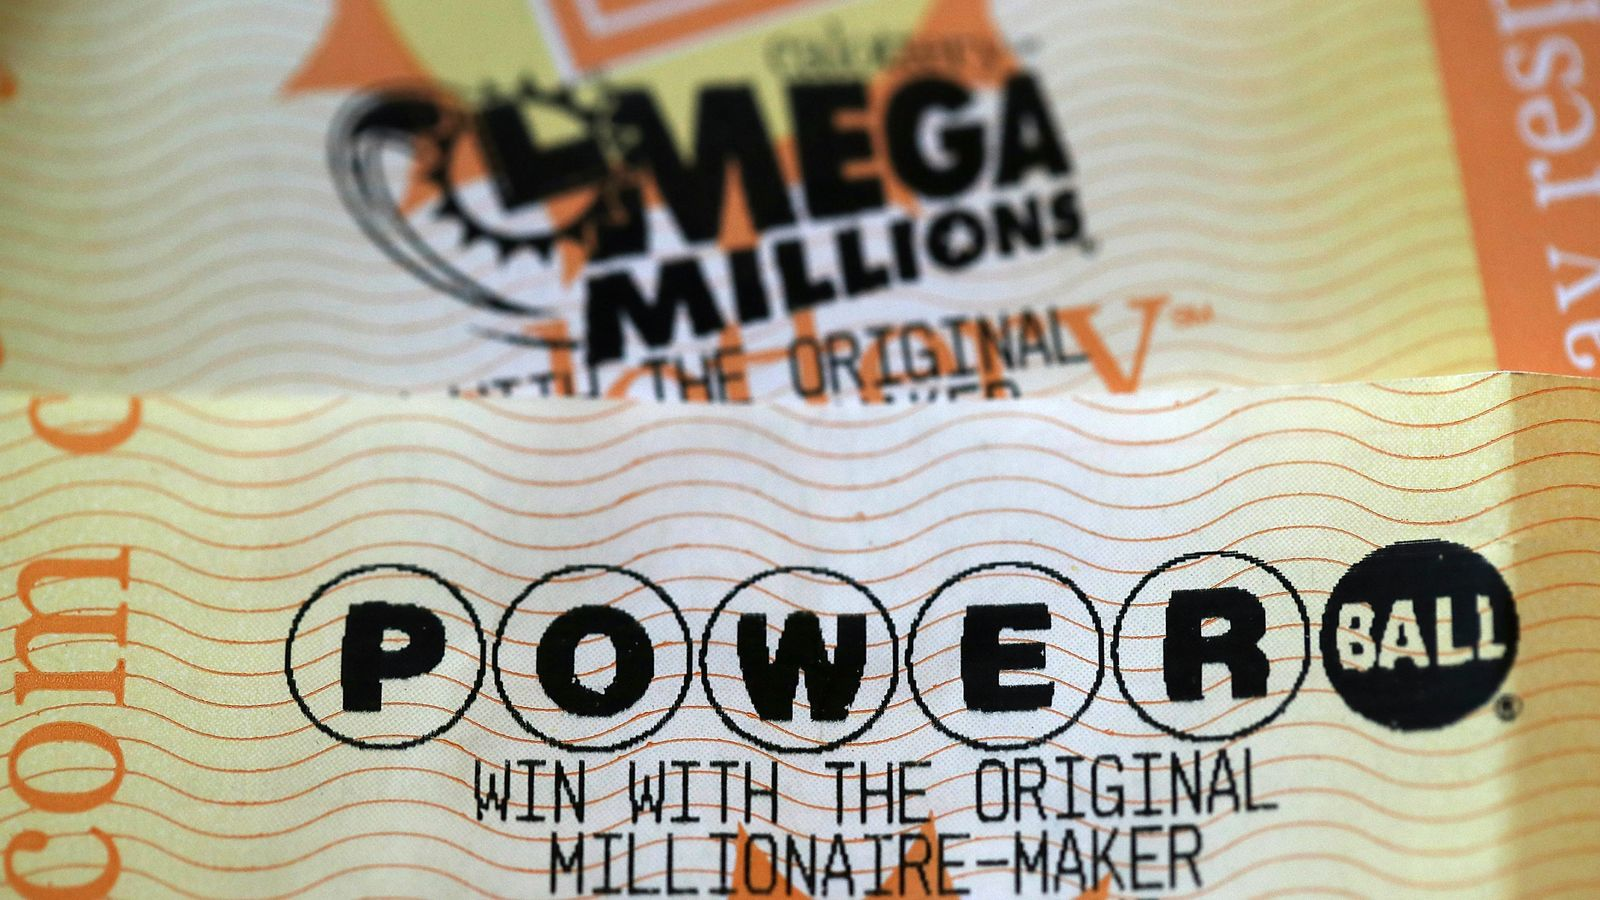 mega million sweepstakes lottery company - 28 images - mega